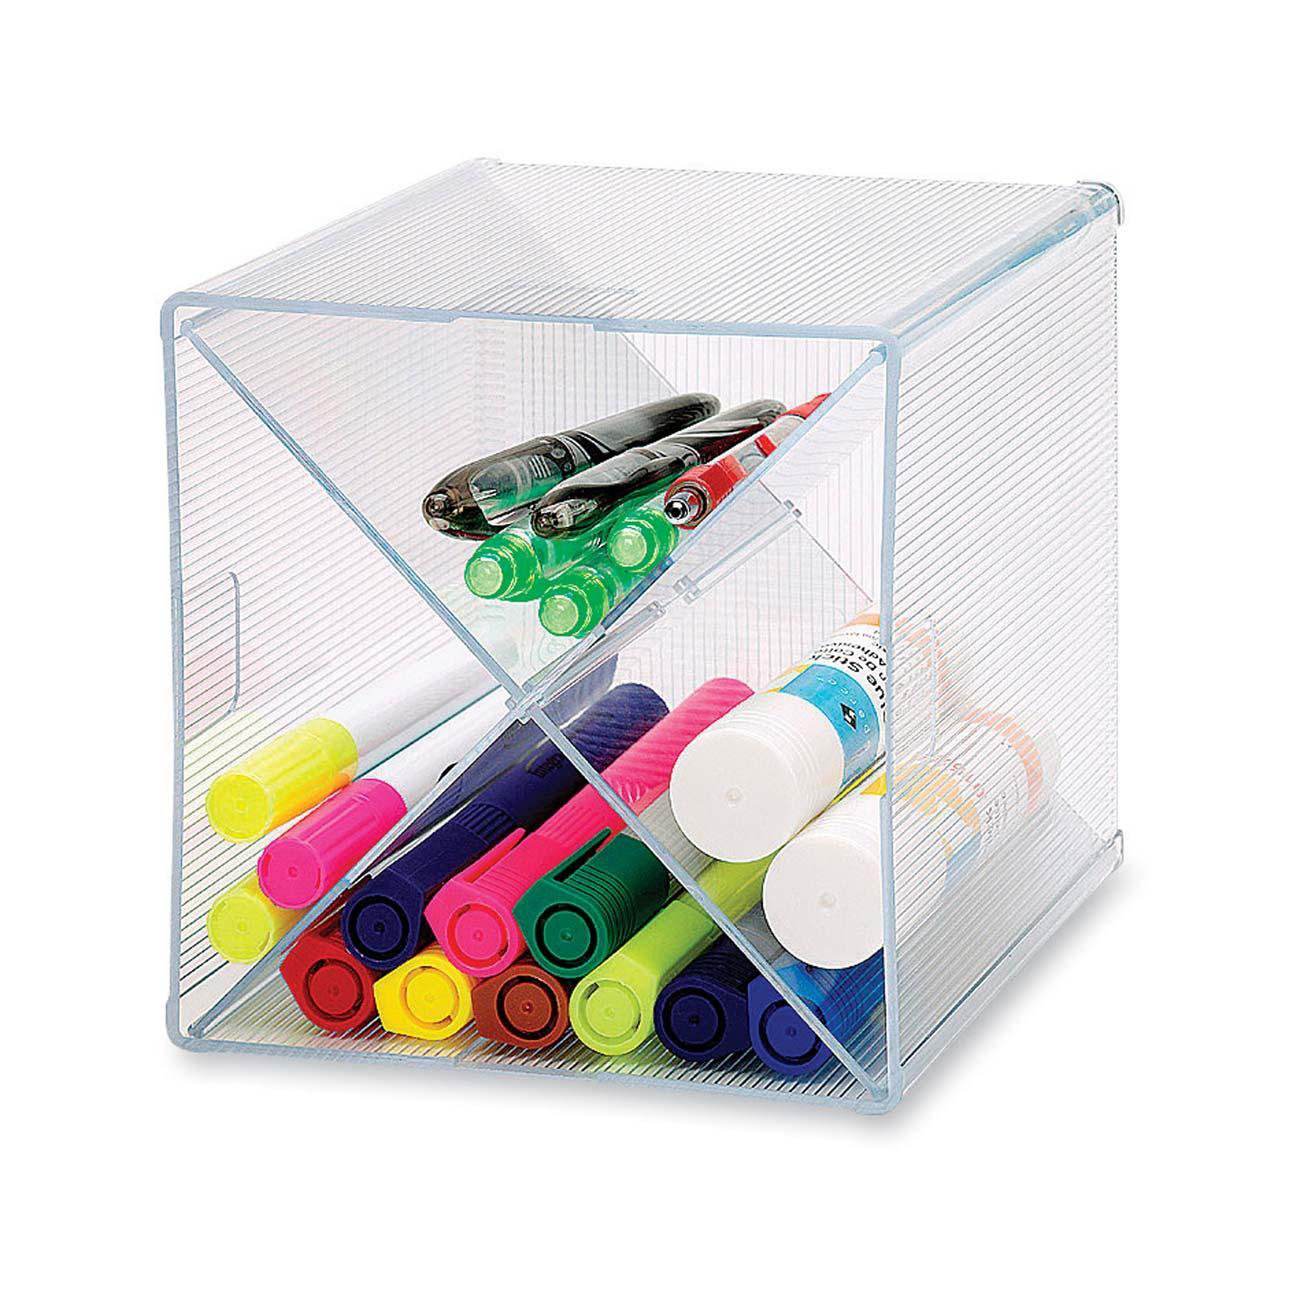 Sparco Storage Organizer, X-Cube, 6 x 6 x 6 Inches, Clear (SPR82979)